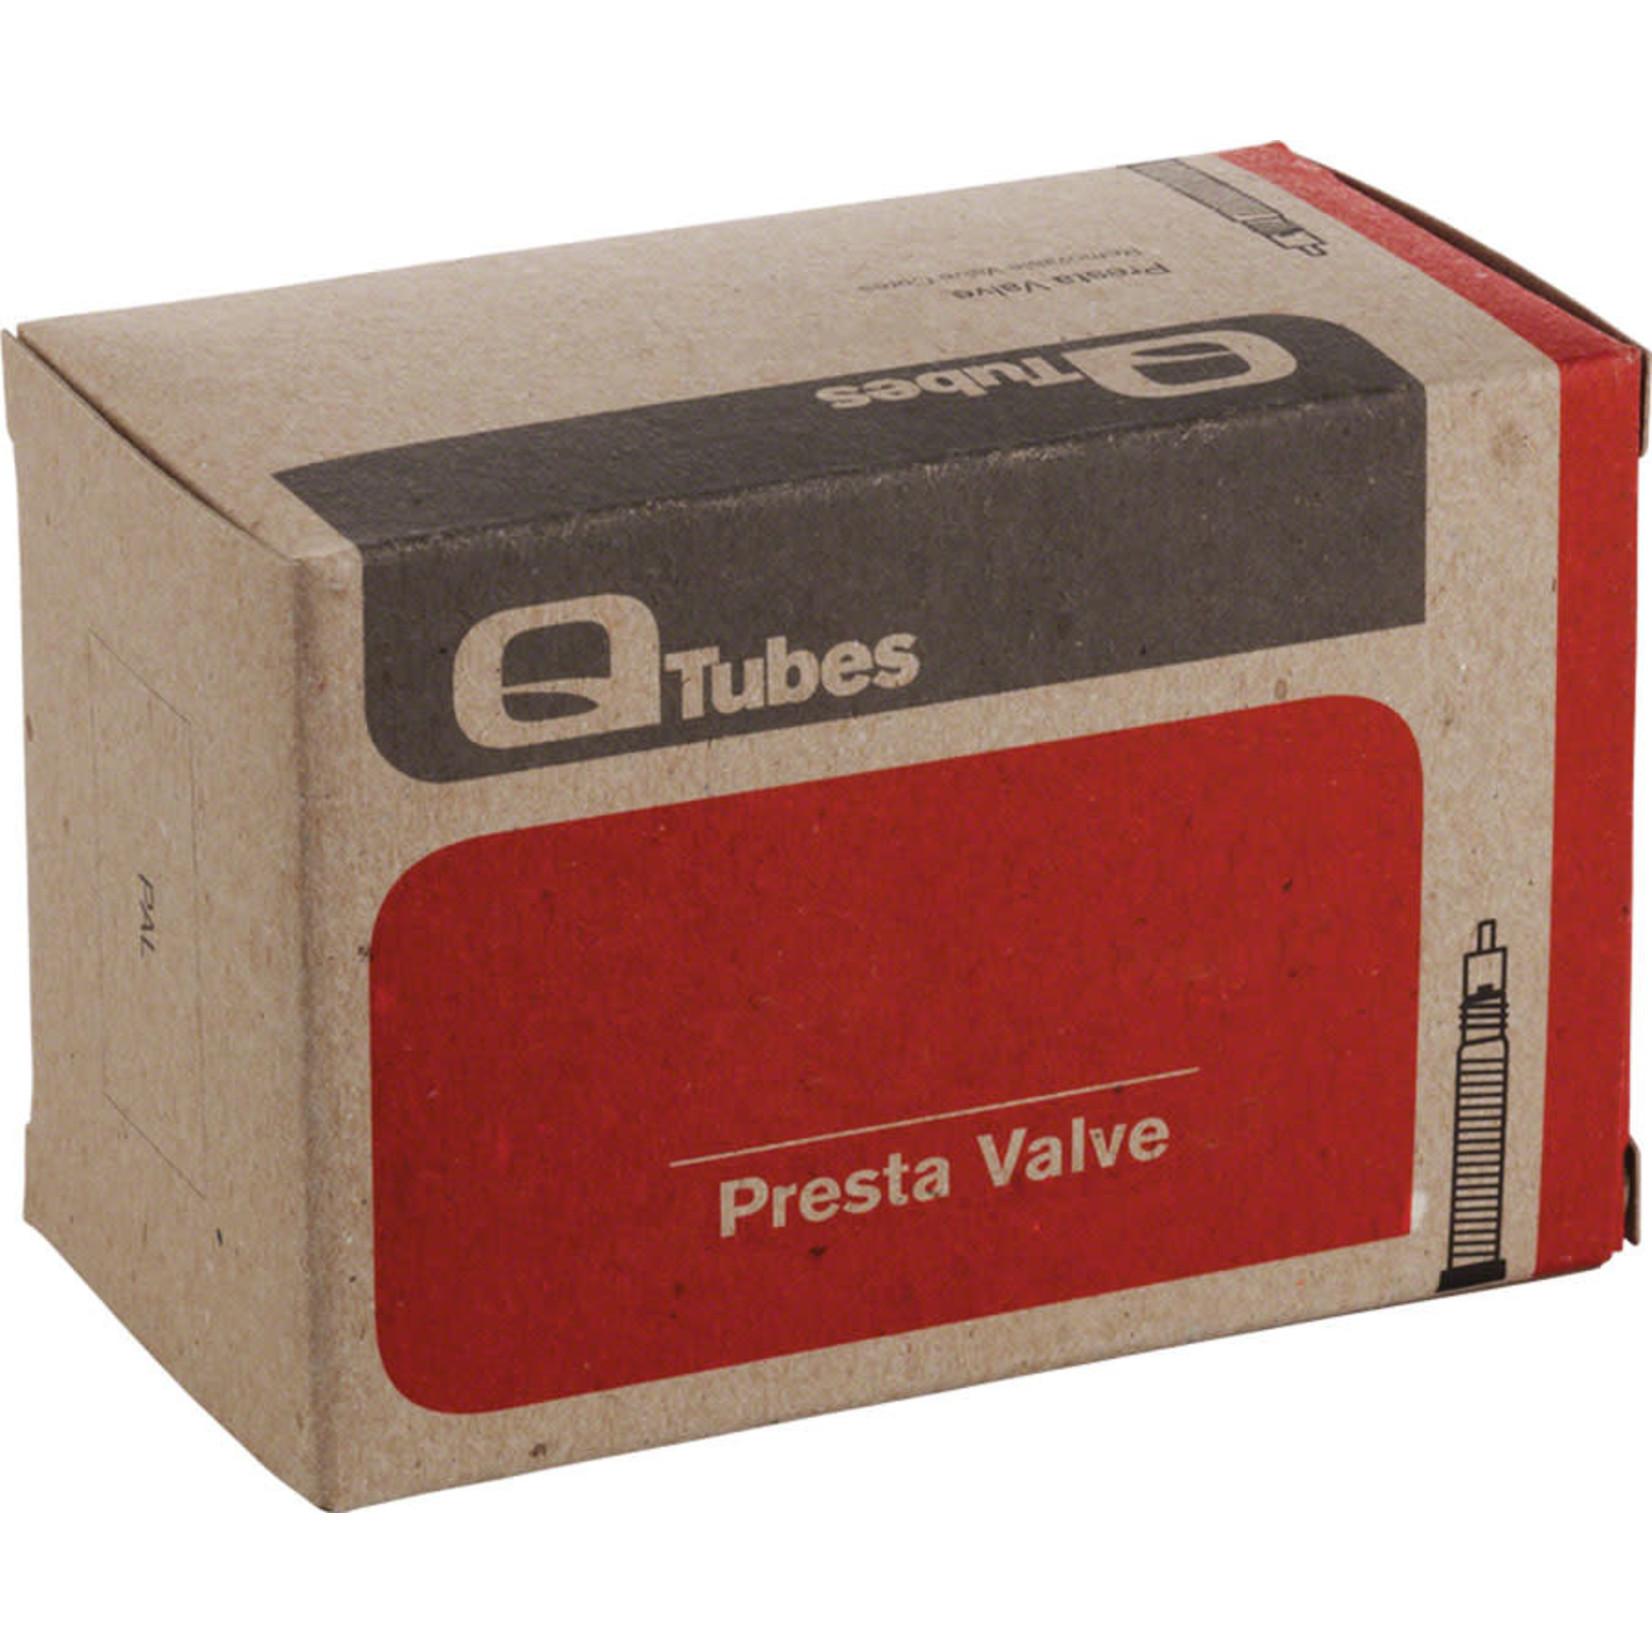 Q-Tubes Q-Tubes 700c x 28-32mm 32mm Presta Valve Tube 128g